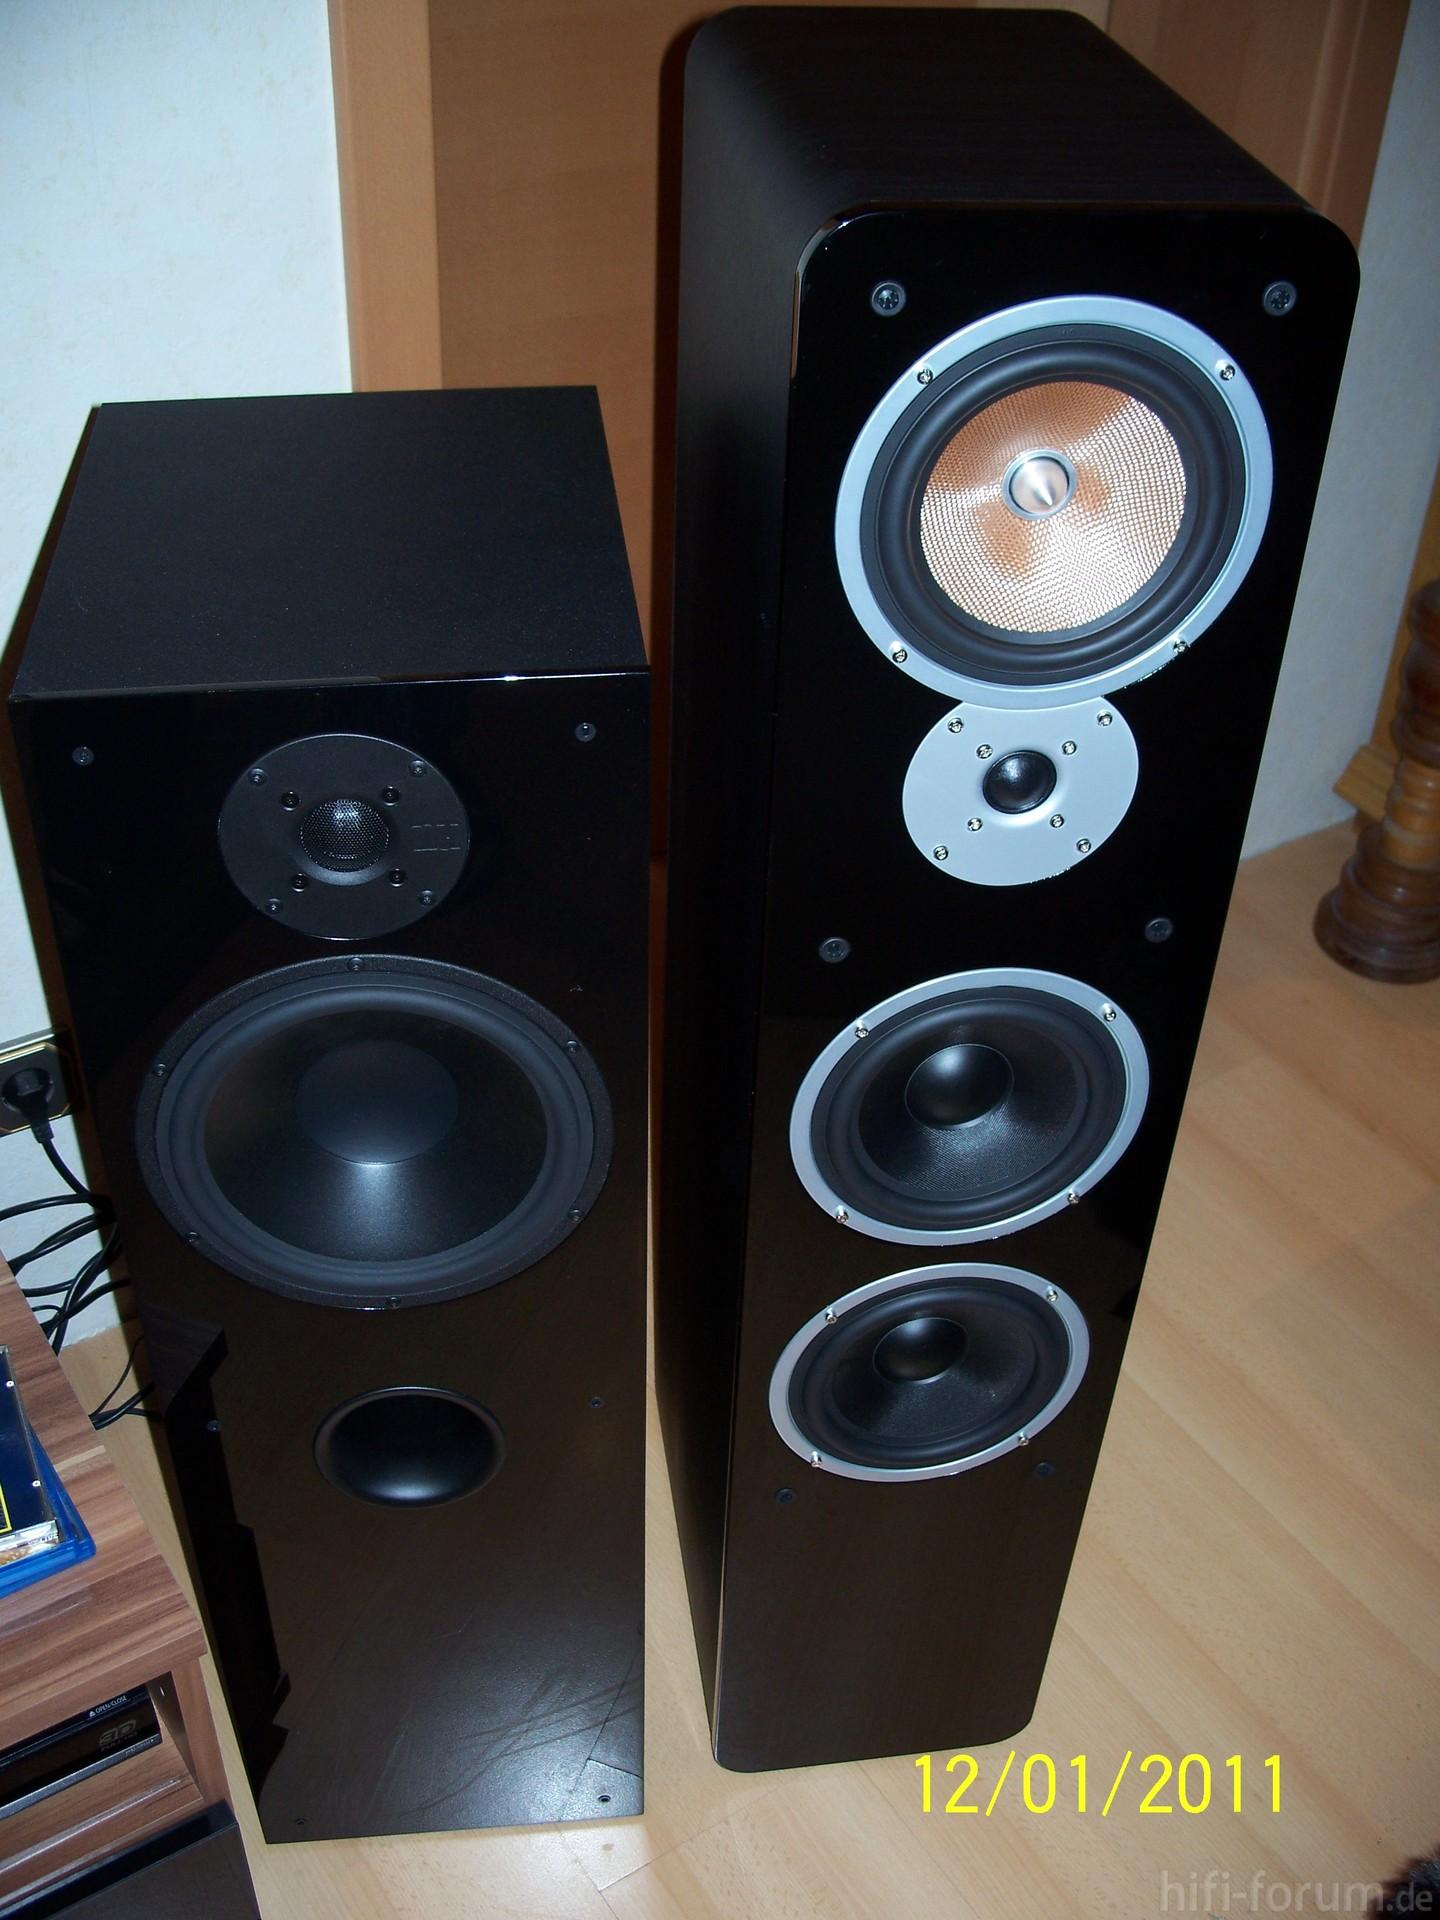 nubox 481 und ultima 40 lautsprecher nubox stereo ultima hifi bildergalerie. Black Bedroom Furniture Sets. Home Design Ideas